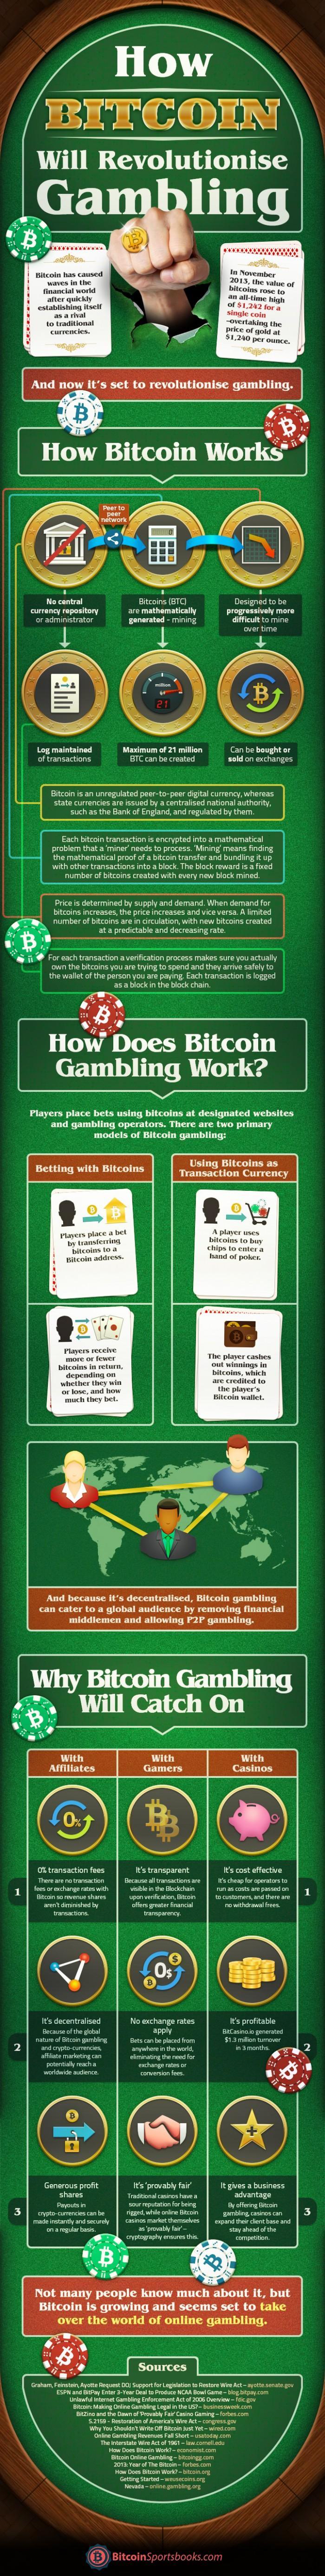 How Bitcoin Will Revolutionize Gambling